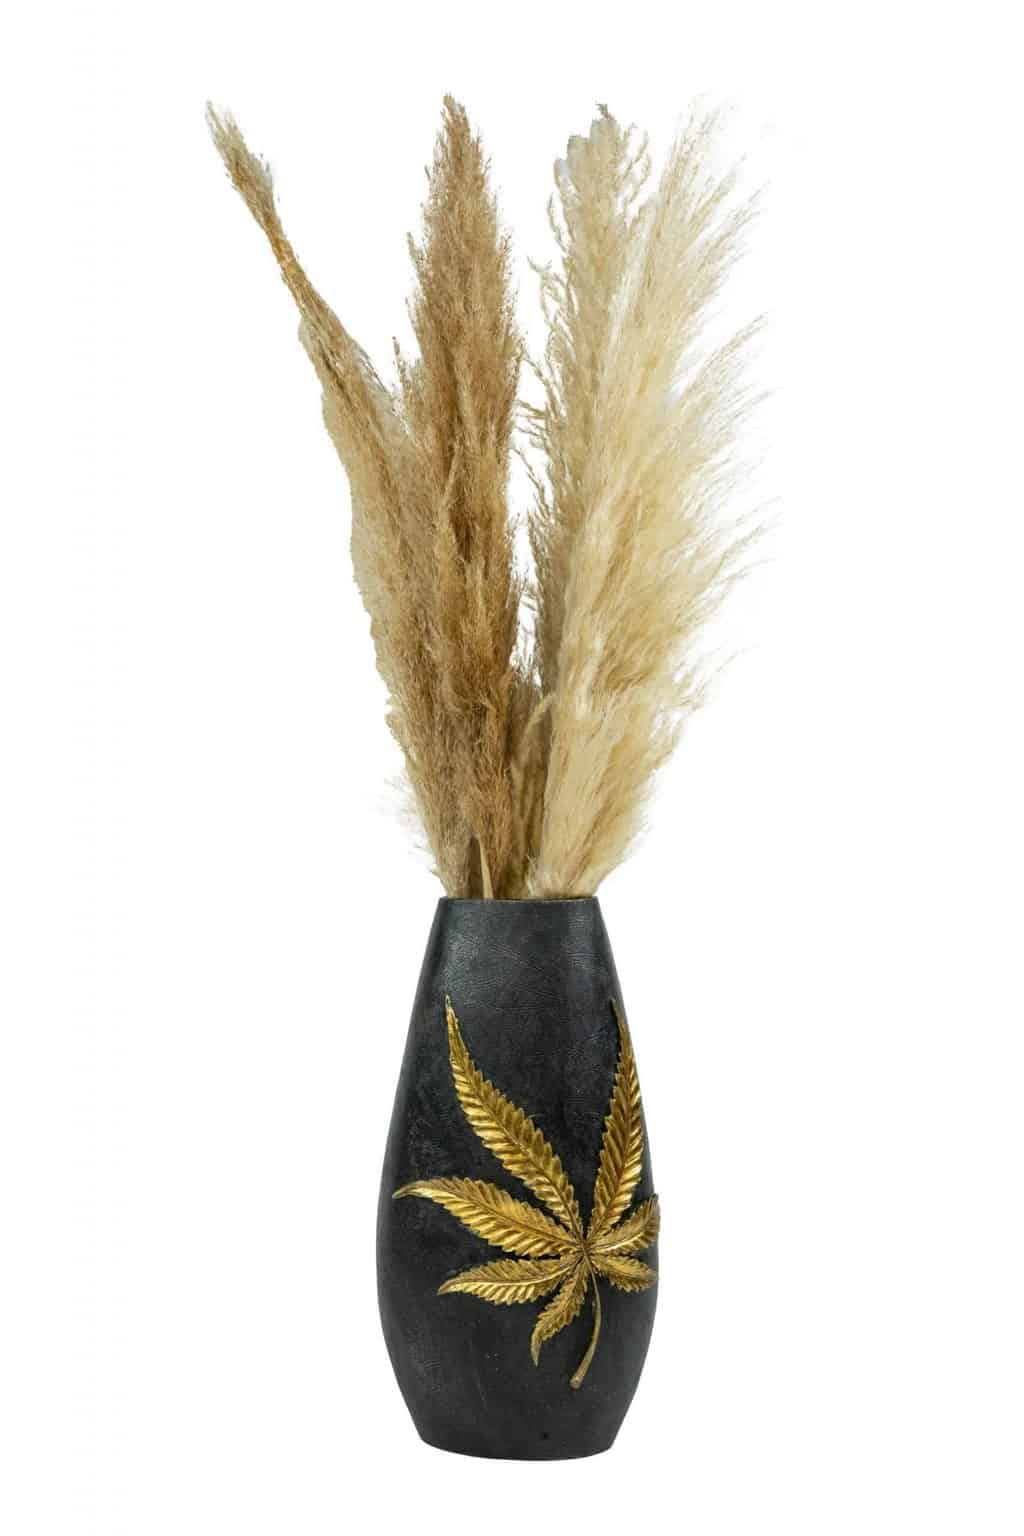 Bloemenvaas-zwart-goud-39-cm-3-scaled-1.jpg